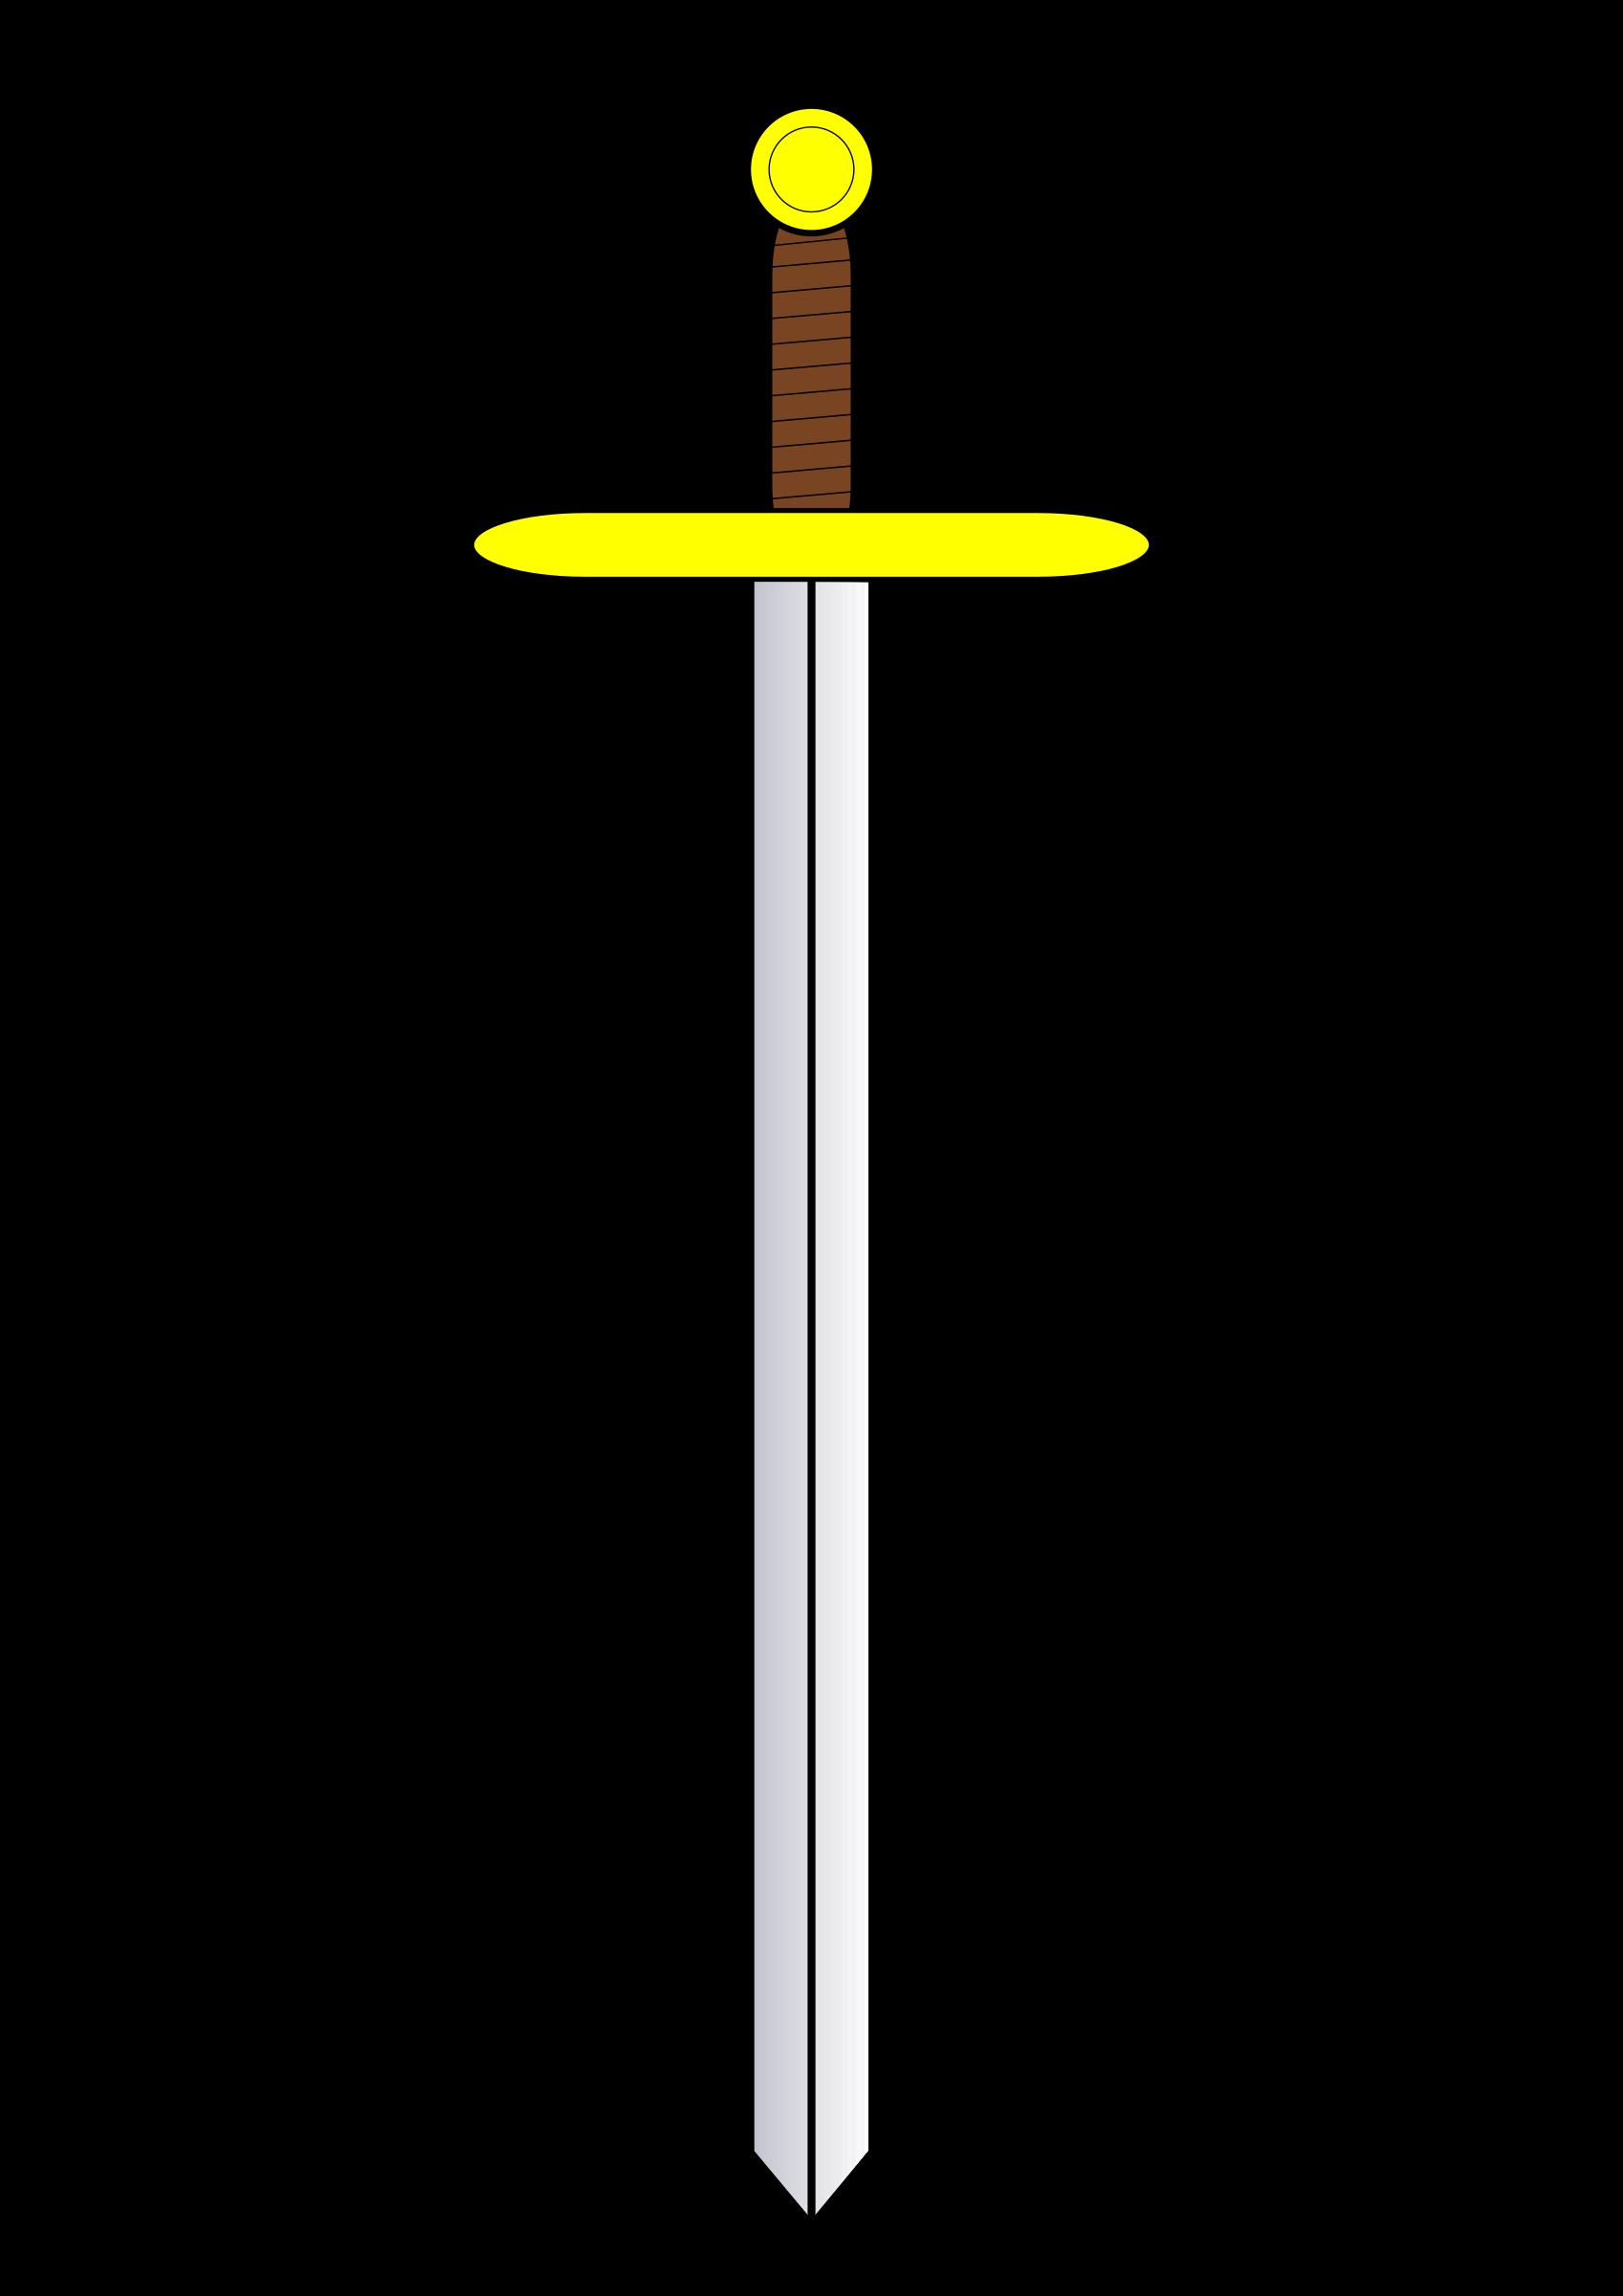 Granado Espada Player character Video game Model sheet, Granado Espada,  weapon, imc Games, knight png   Klipartz